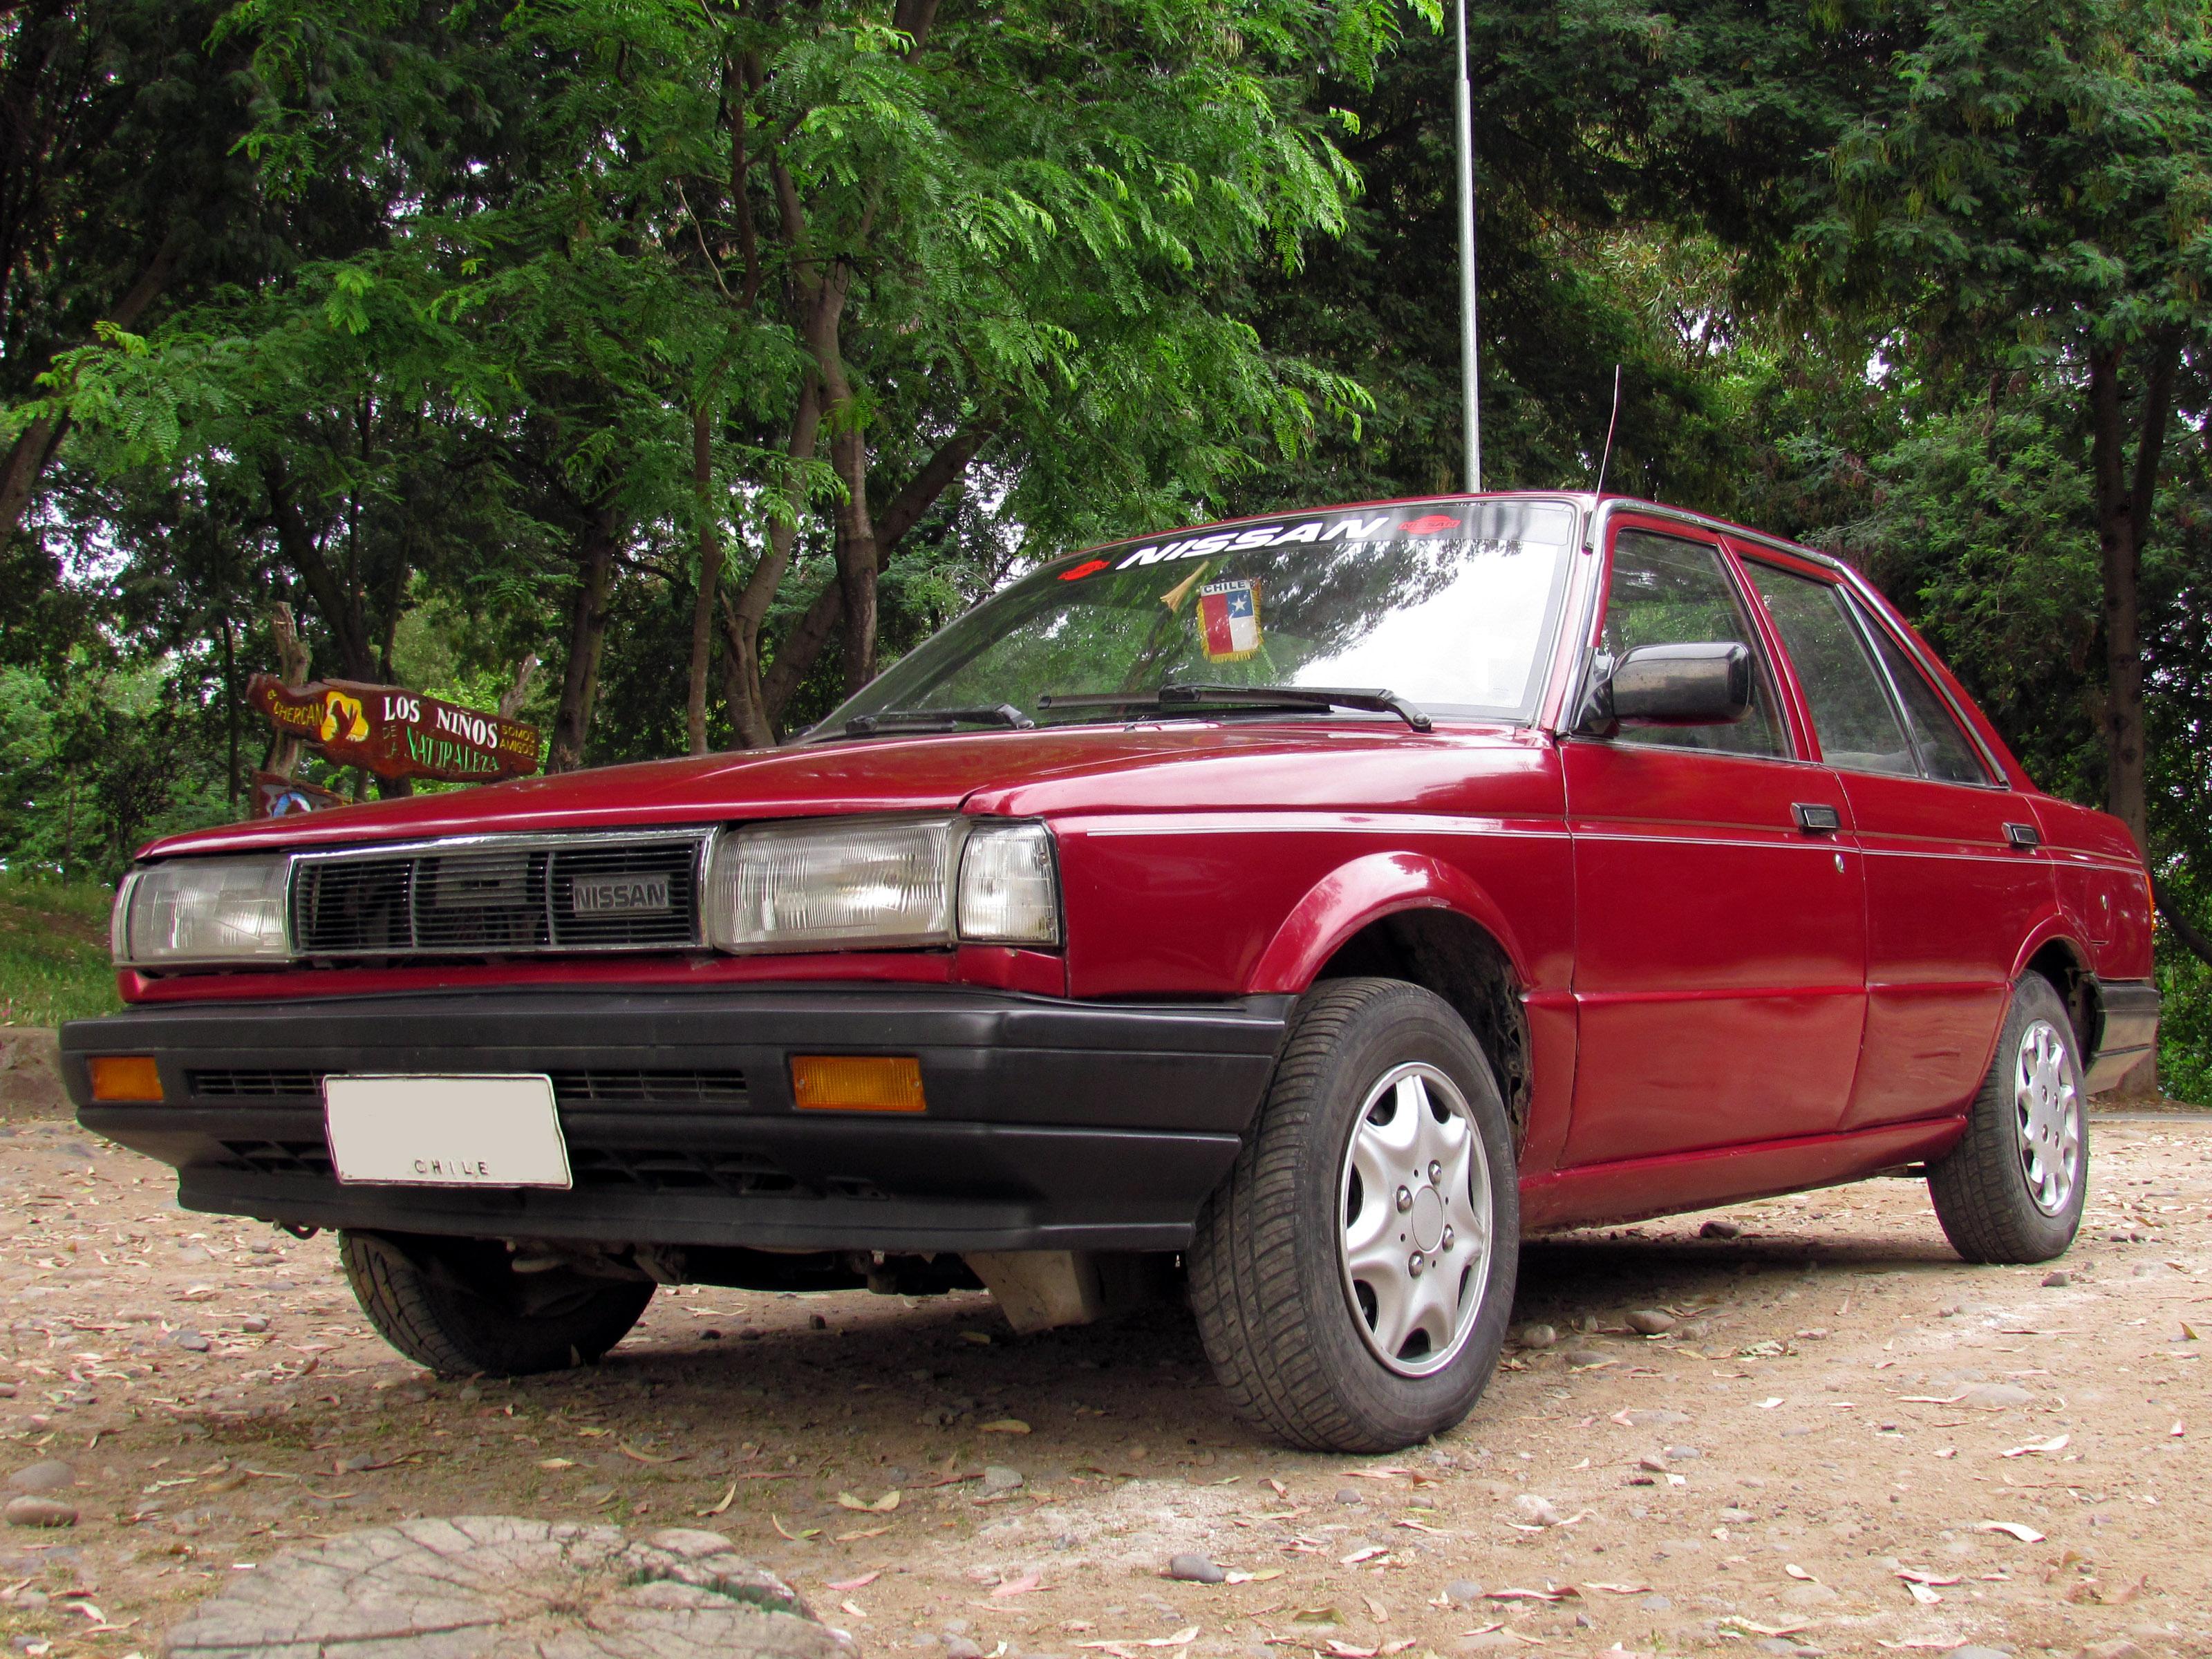 Nissan sentra history